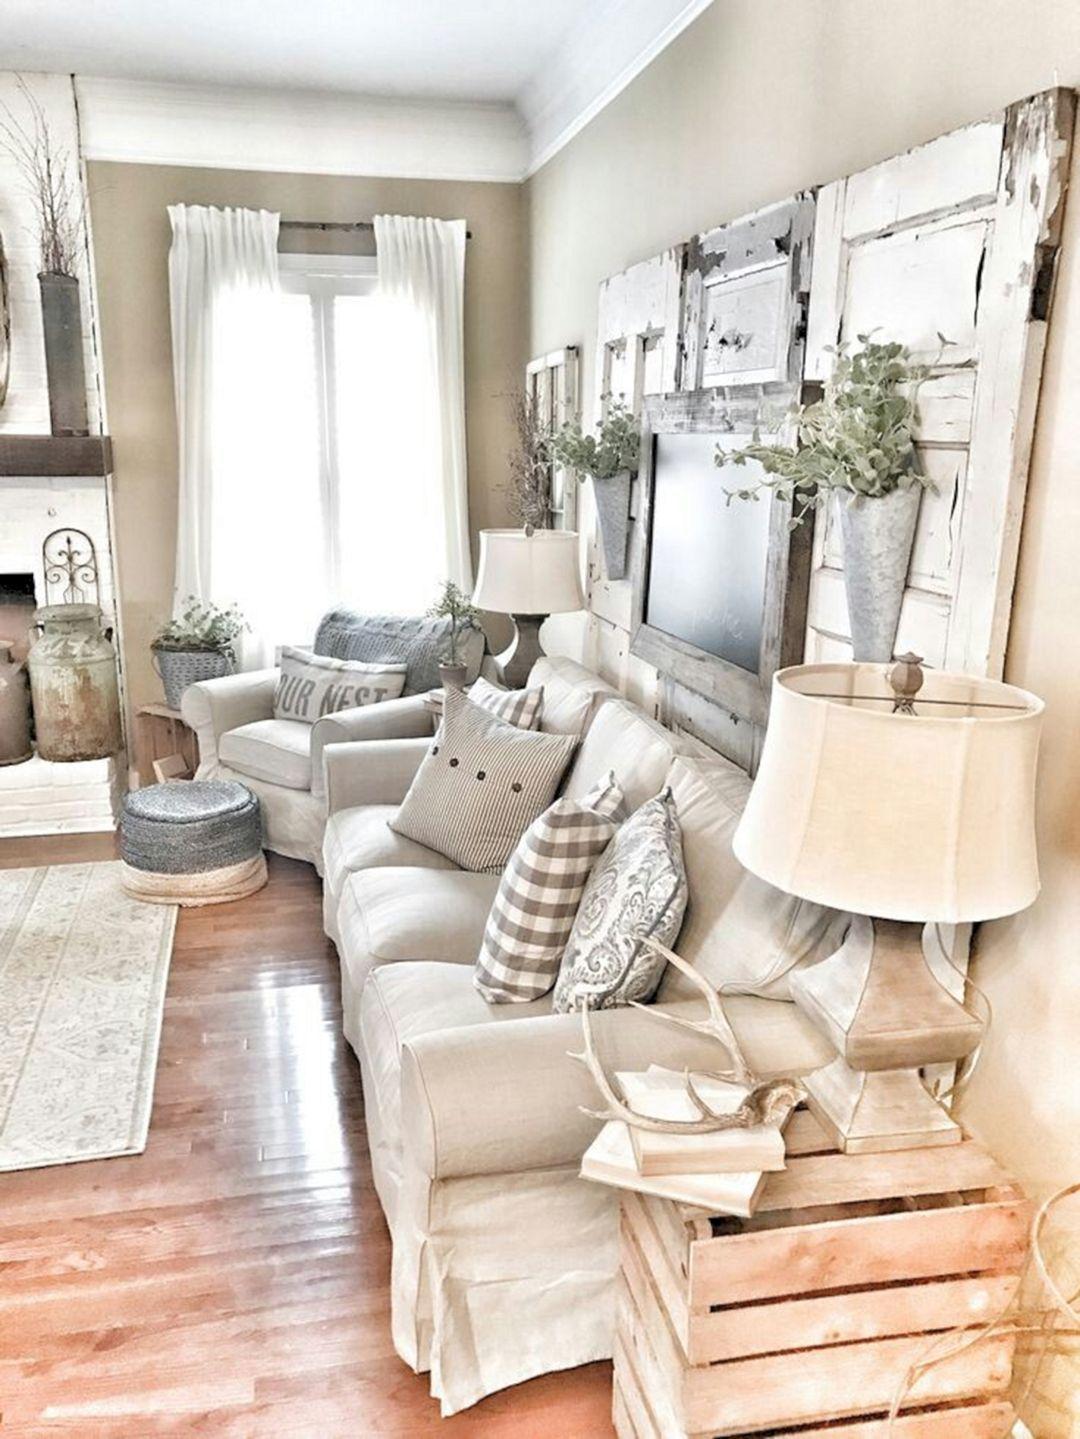 Shabby Chic Living Room Ideas For the Modern Homeowner